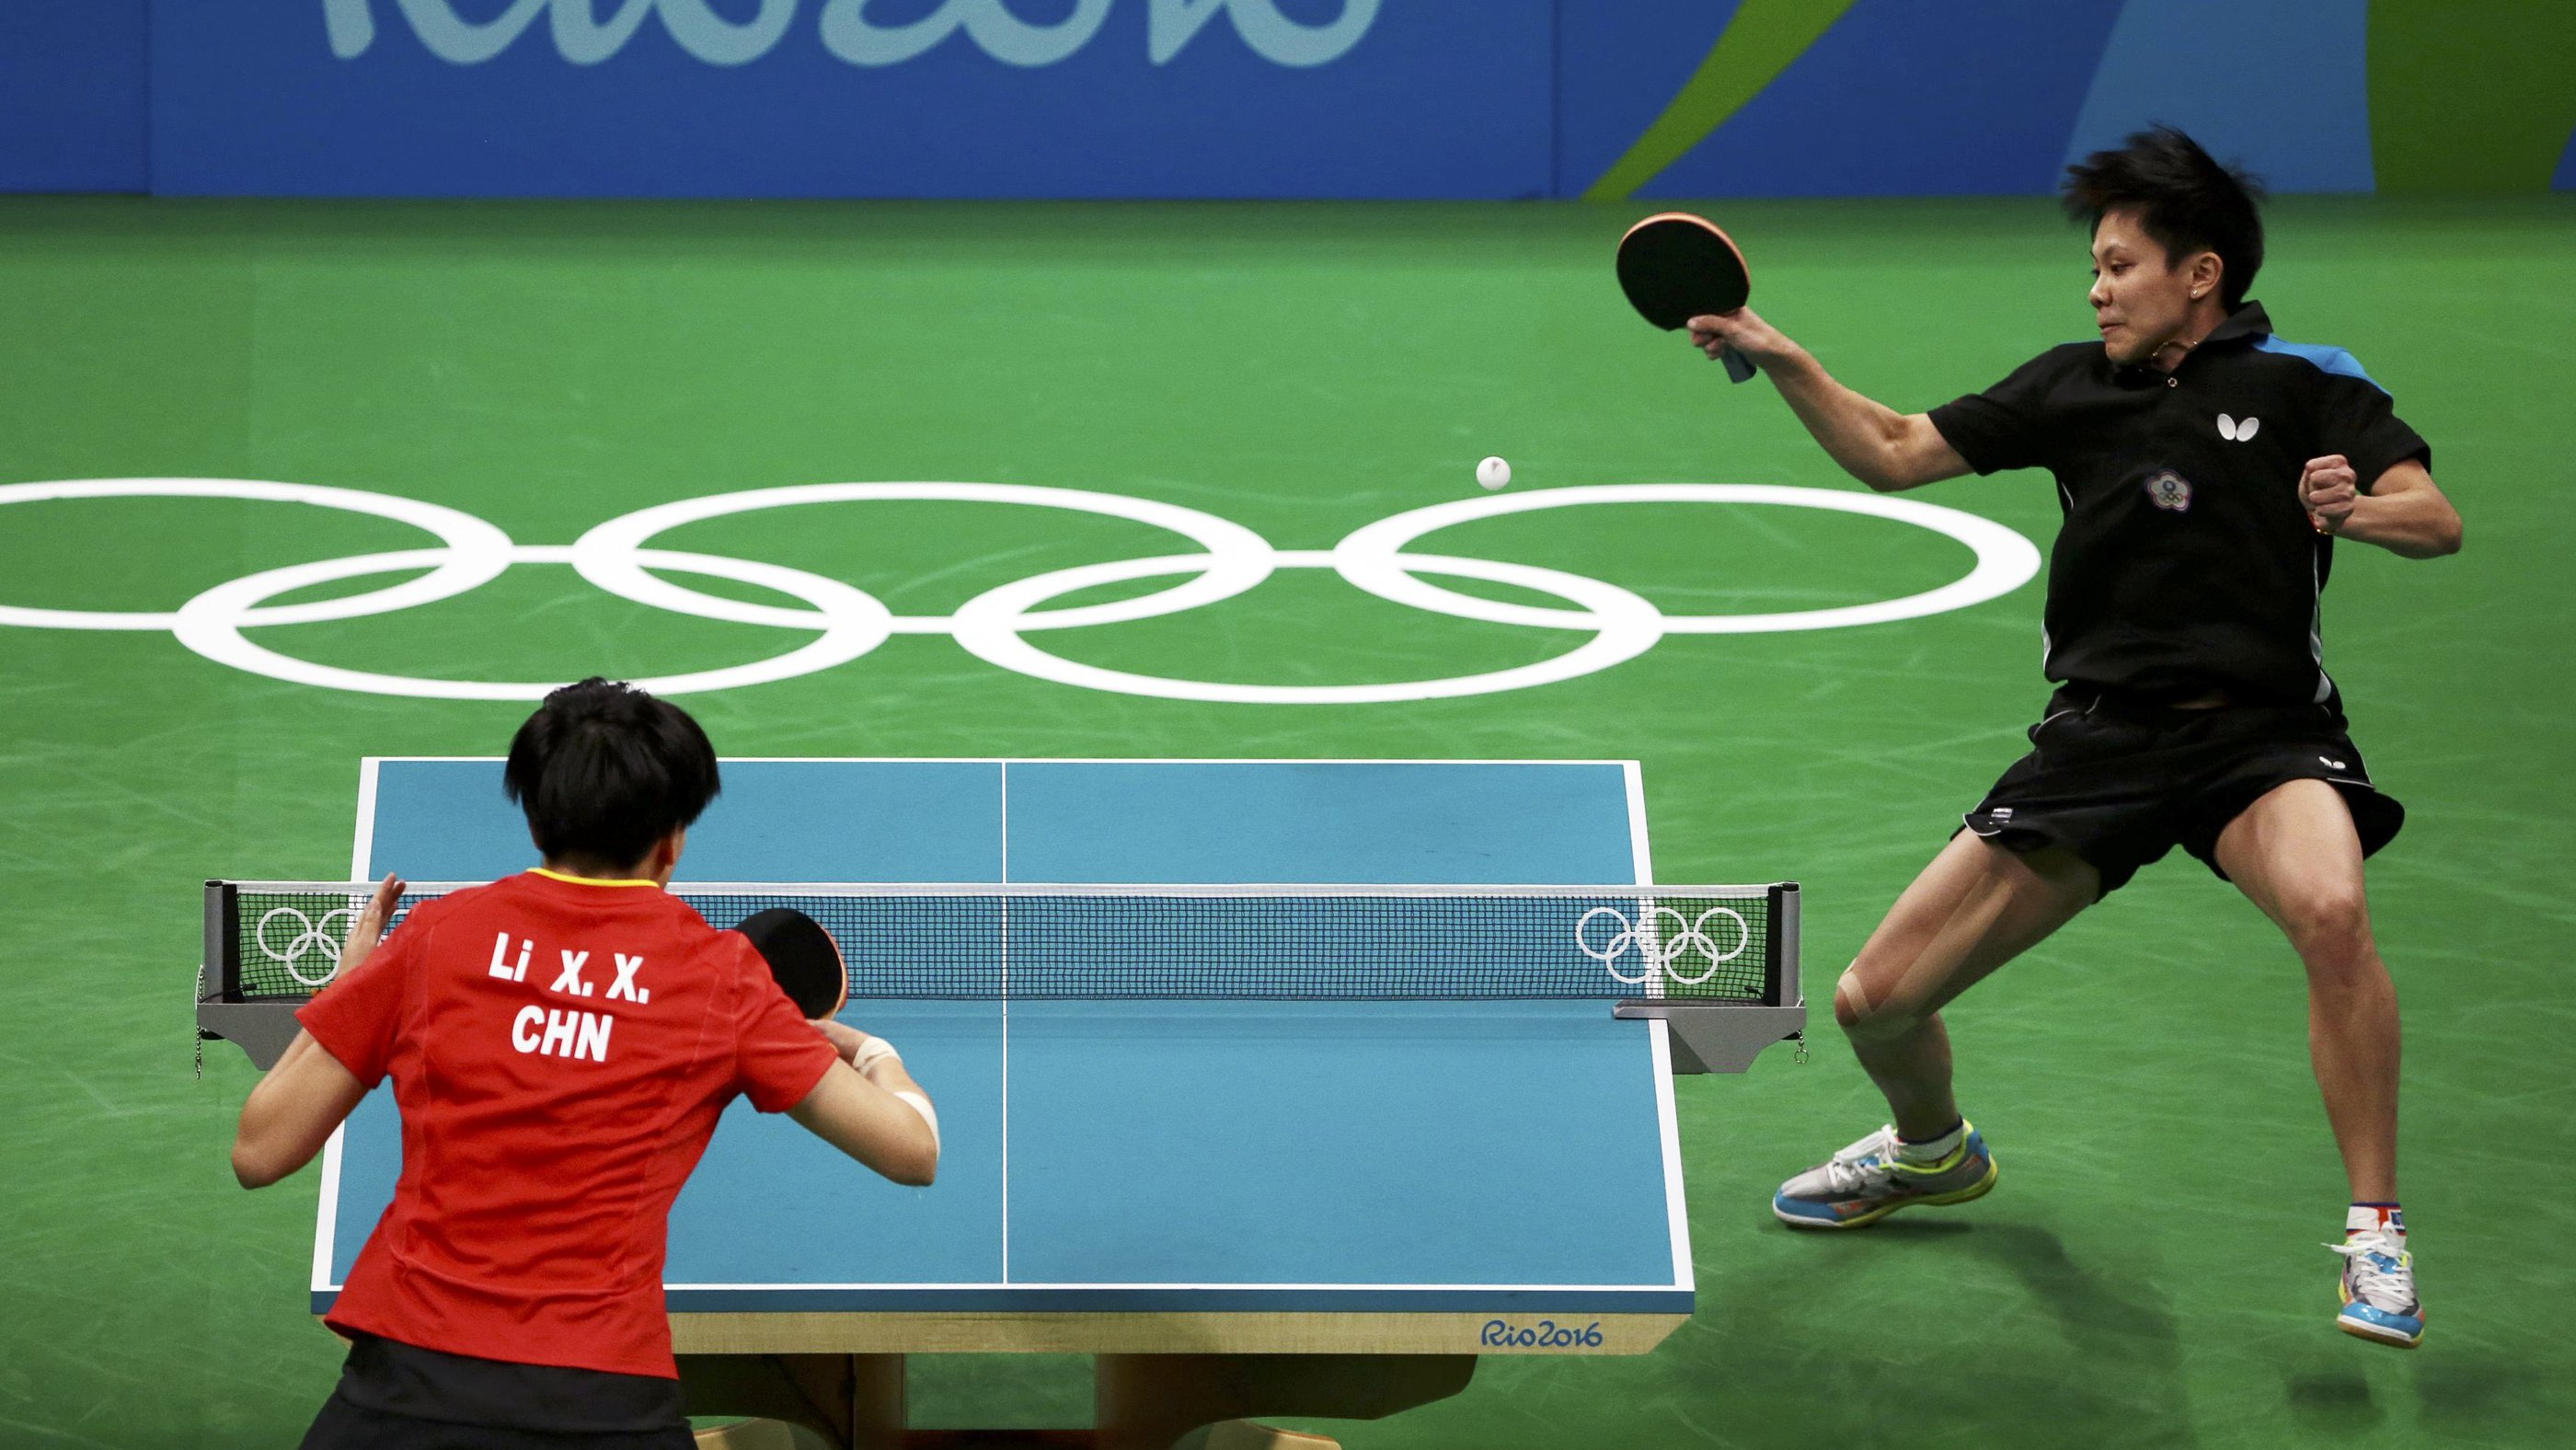 2016 Rio Olympics - Table Tennis - Quarterfinals - Women's Singles - Riocentro - Pavilion 3 - Rio de Janeiro, Brazil - 09/08/2016. Cheng I-Ching (TPE) of Taiwan plays against Li Xiaoxia (CHN) of China